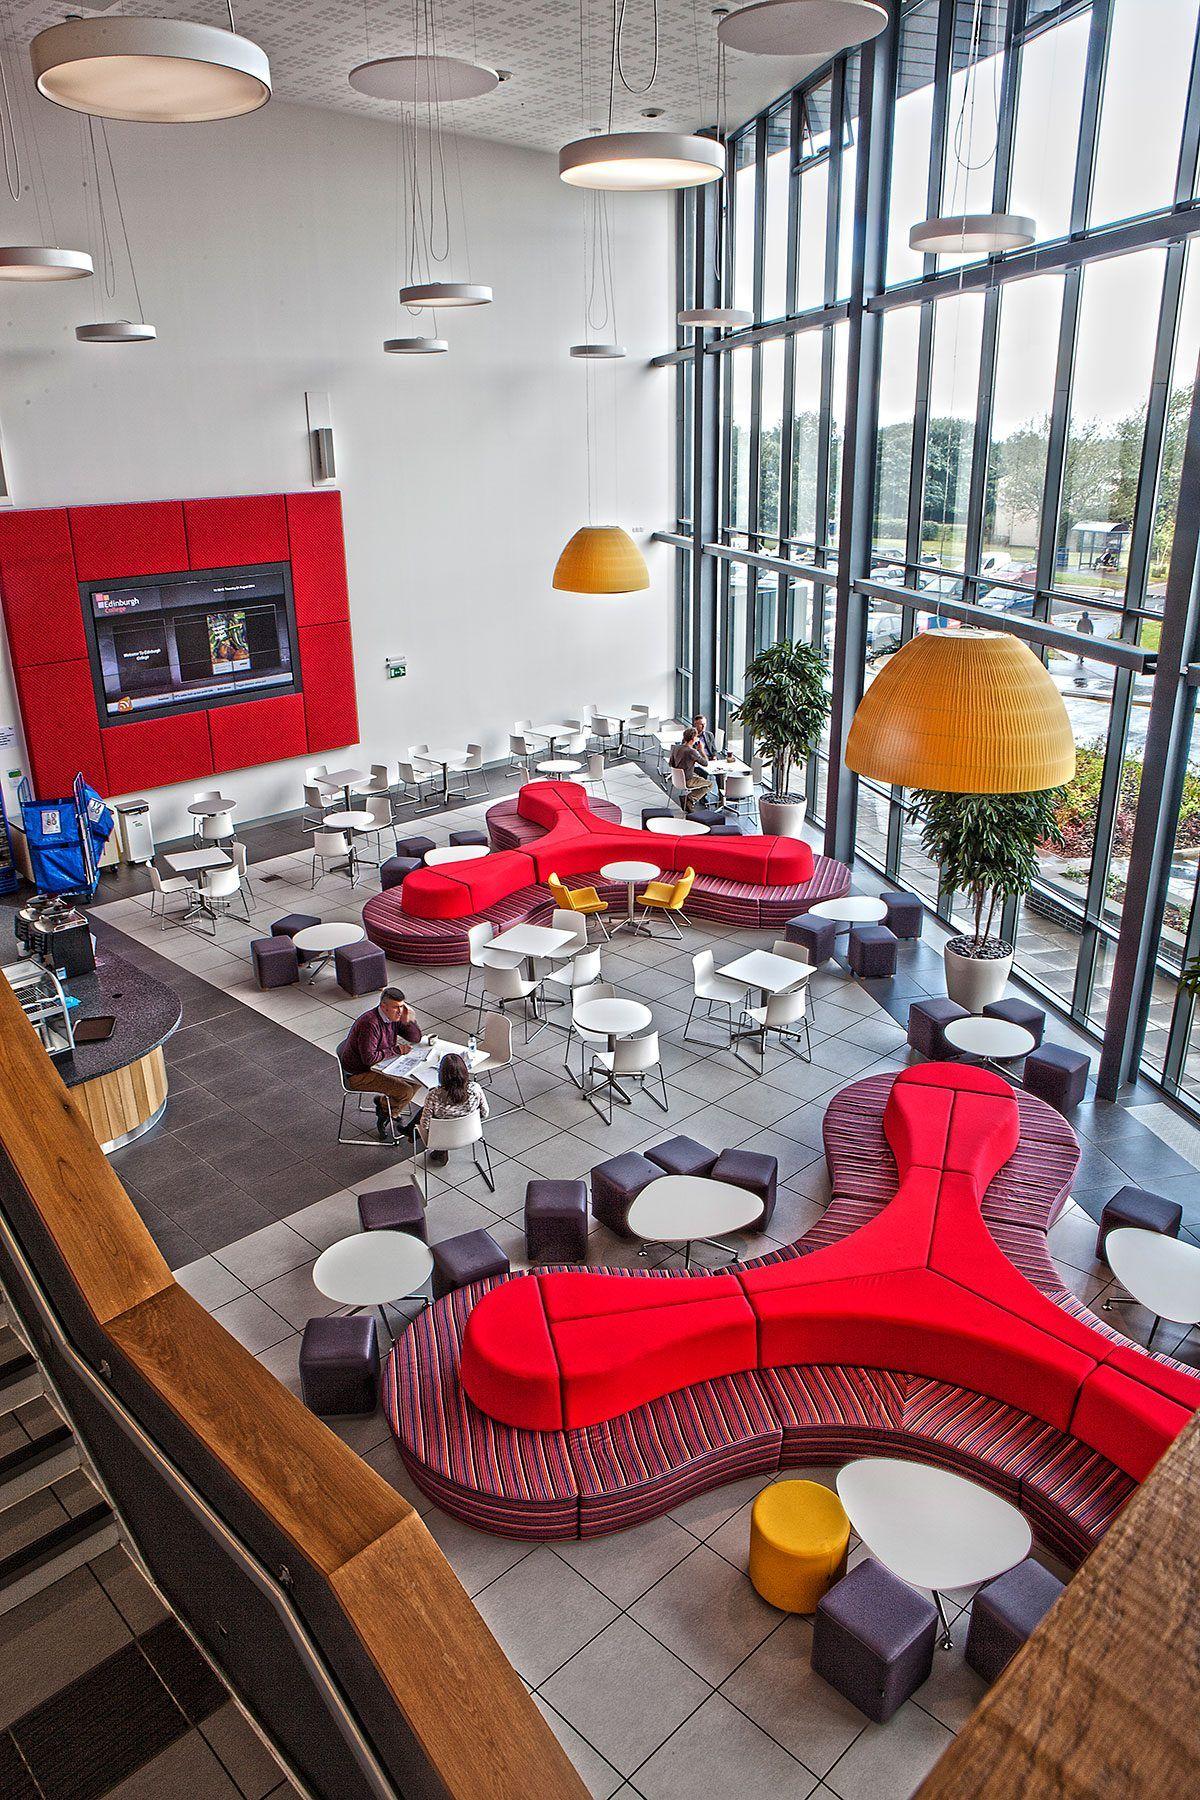 edinburgh college in 2019 edinburgh college install workplace rh pinterest com